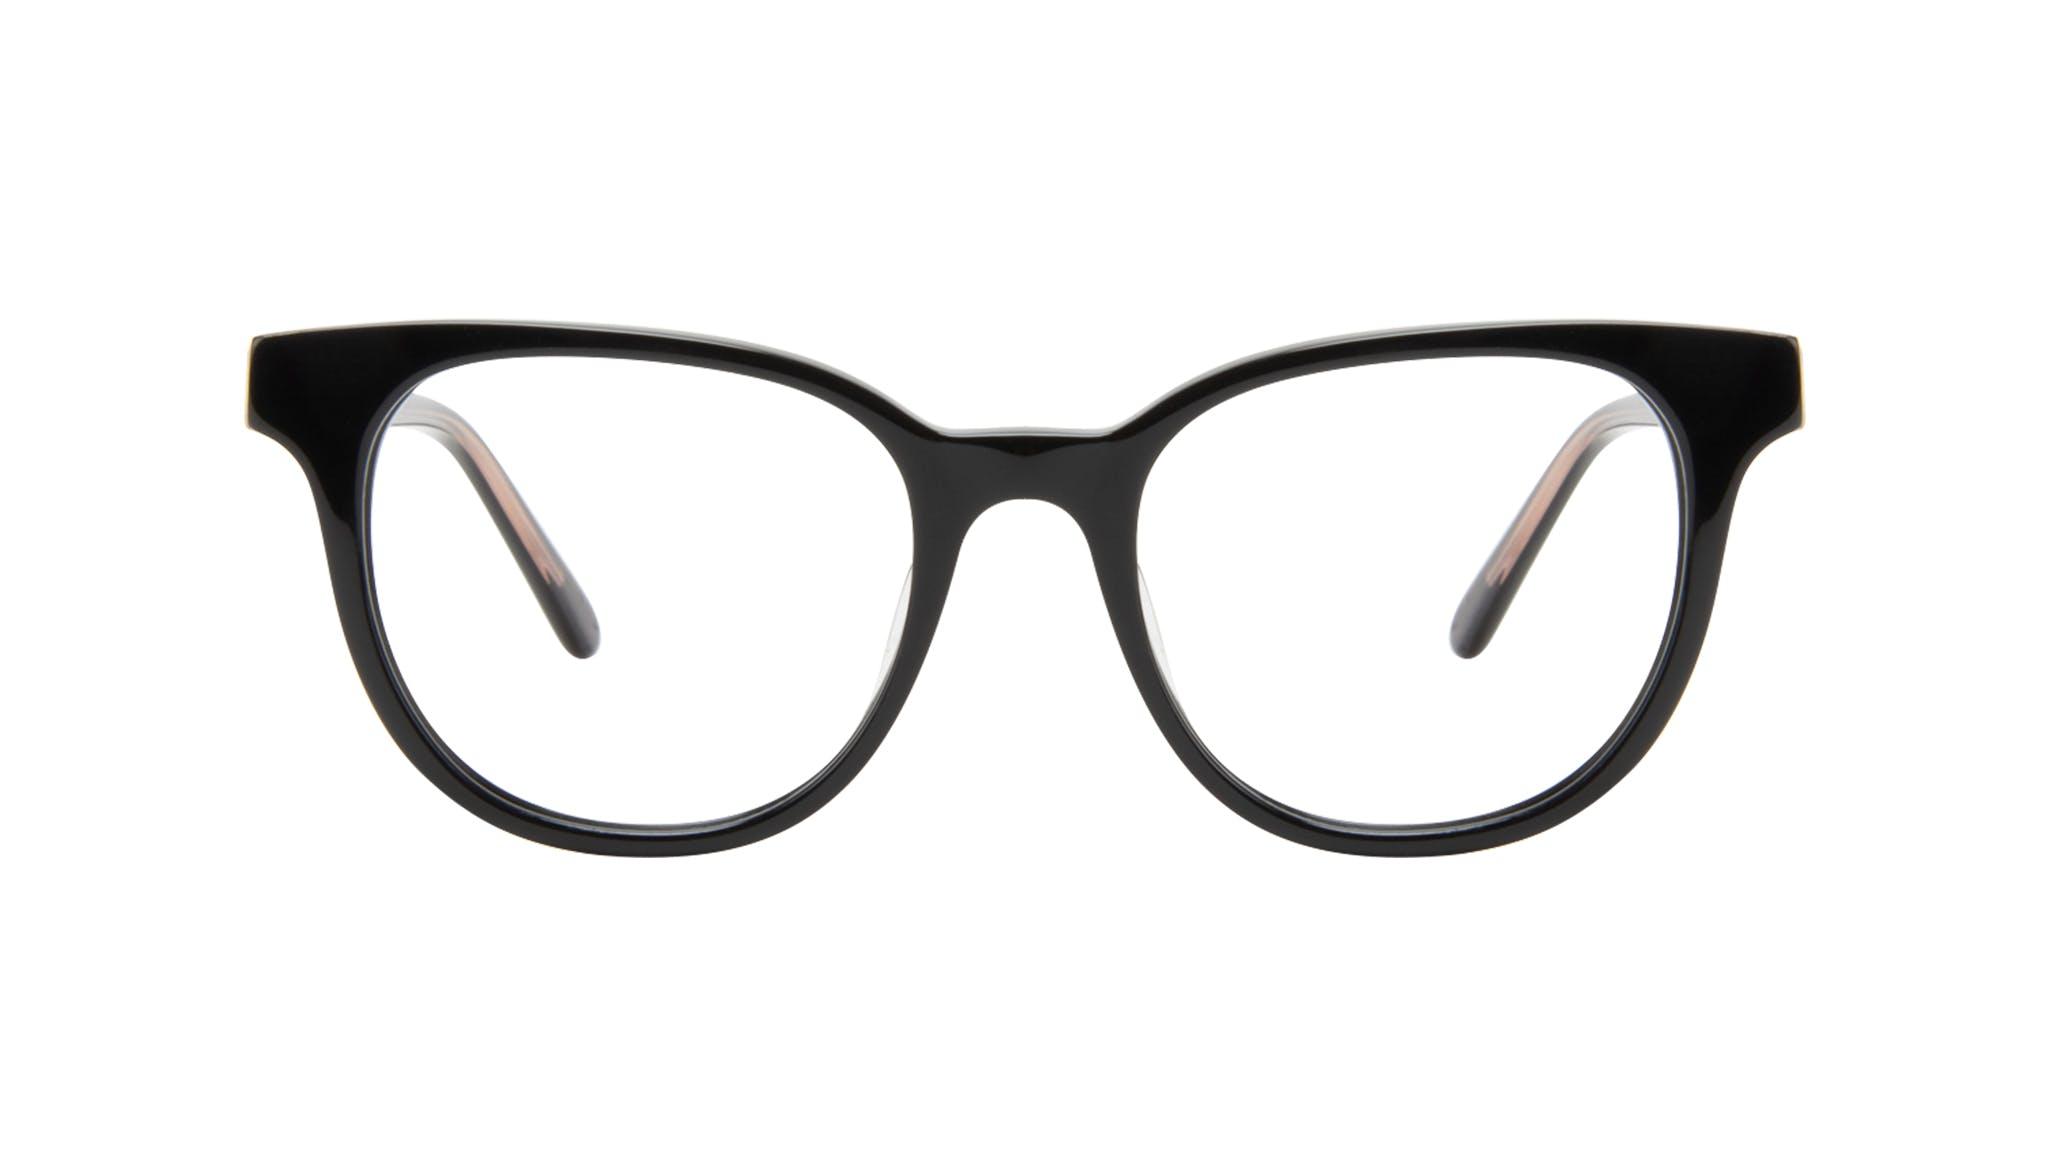 Affordable Fashion Glasses Square Eyeglasses Women Lively Black Front